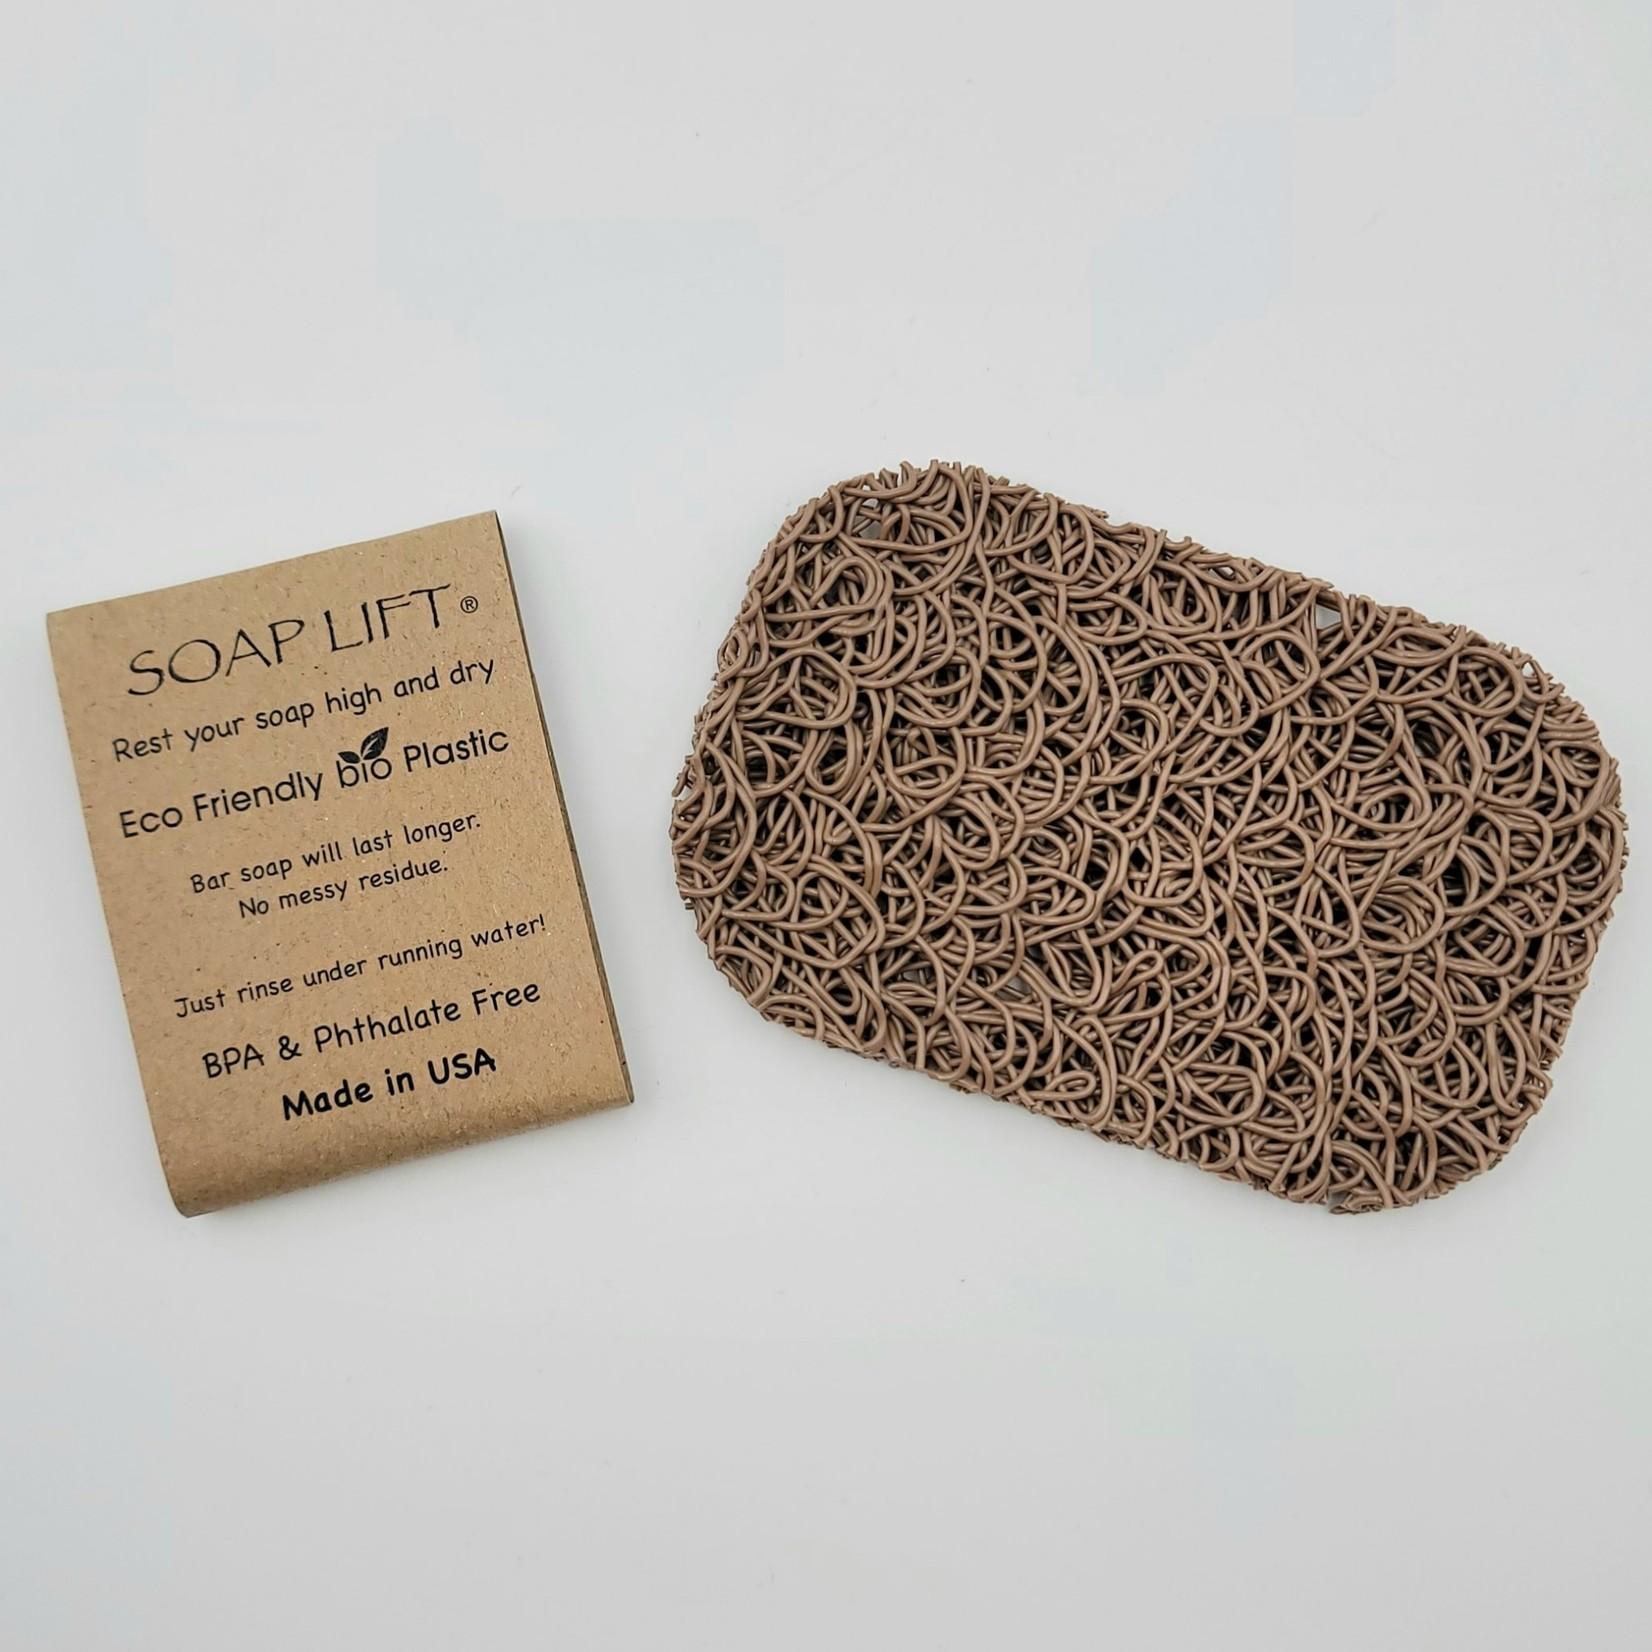 Soap Lifts